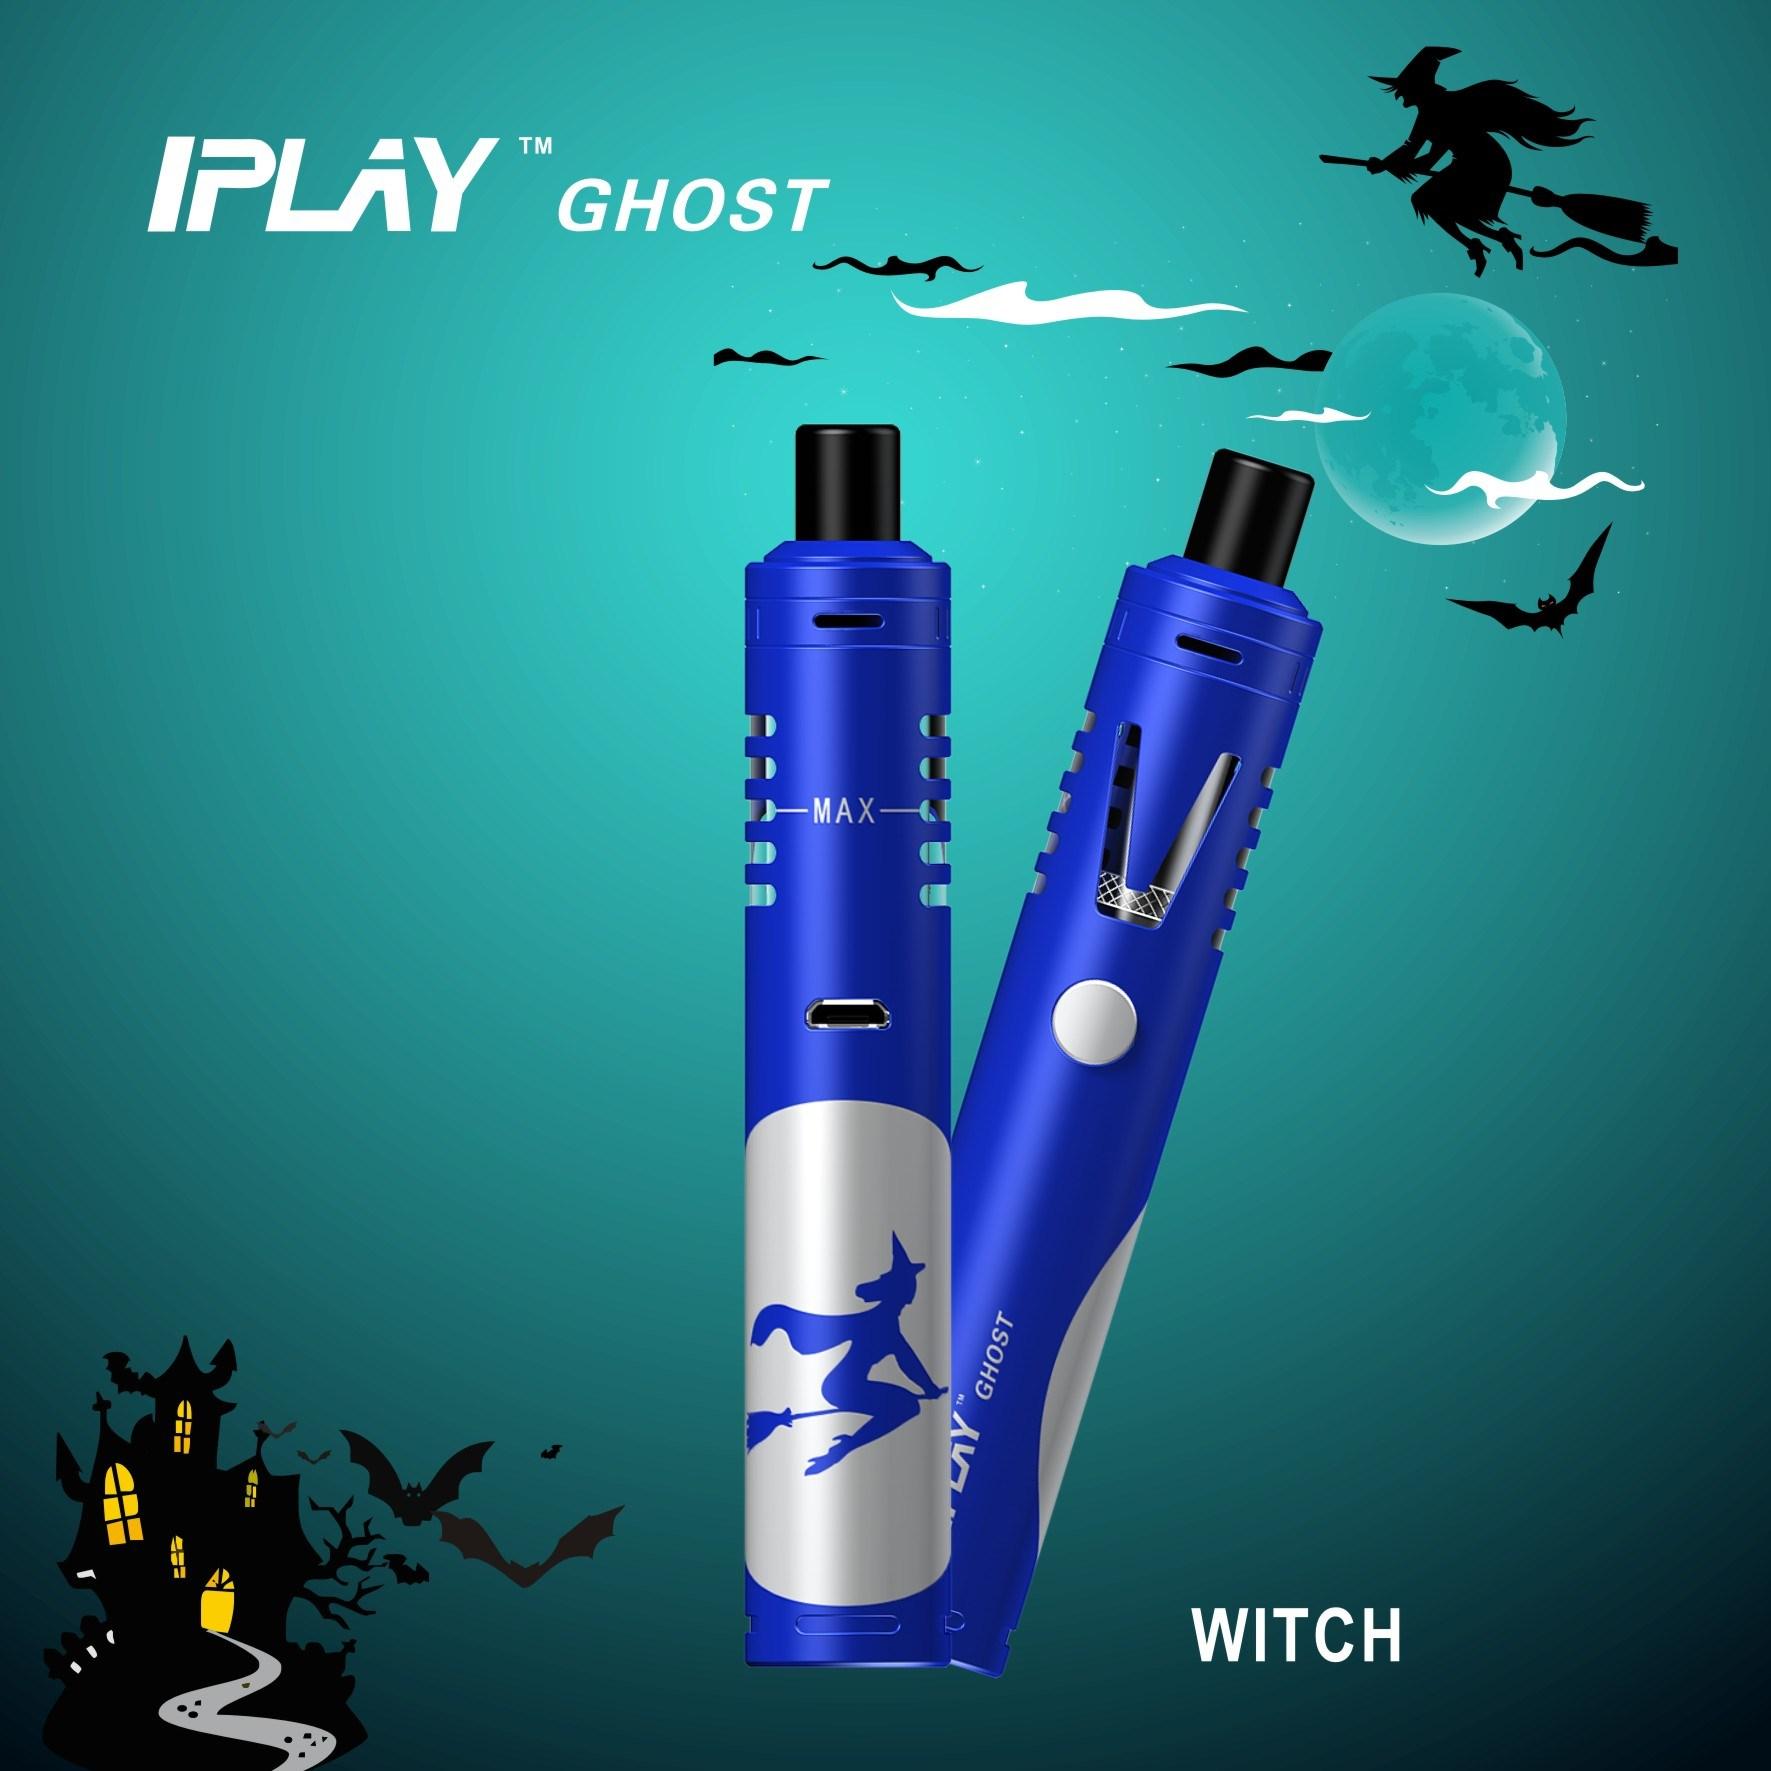 Electronic Cigarette Aio E Cigarette of Eliquid Vape Starter Kit Iplay Ghost